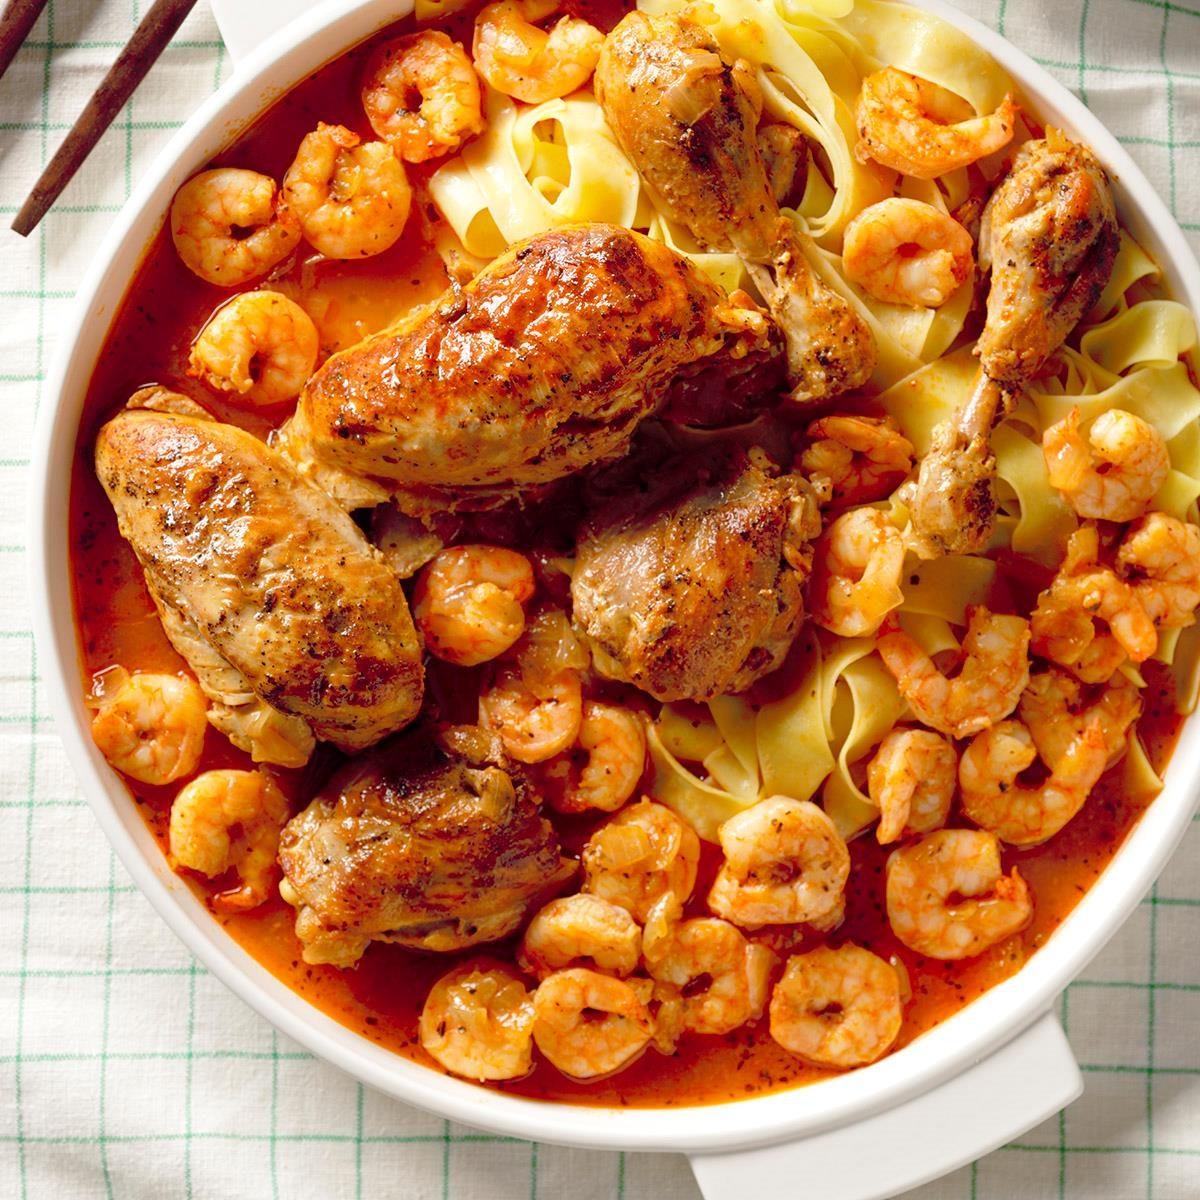 Pressure Cooker Herbed Chicken and Shrimp